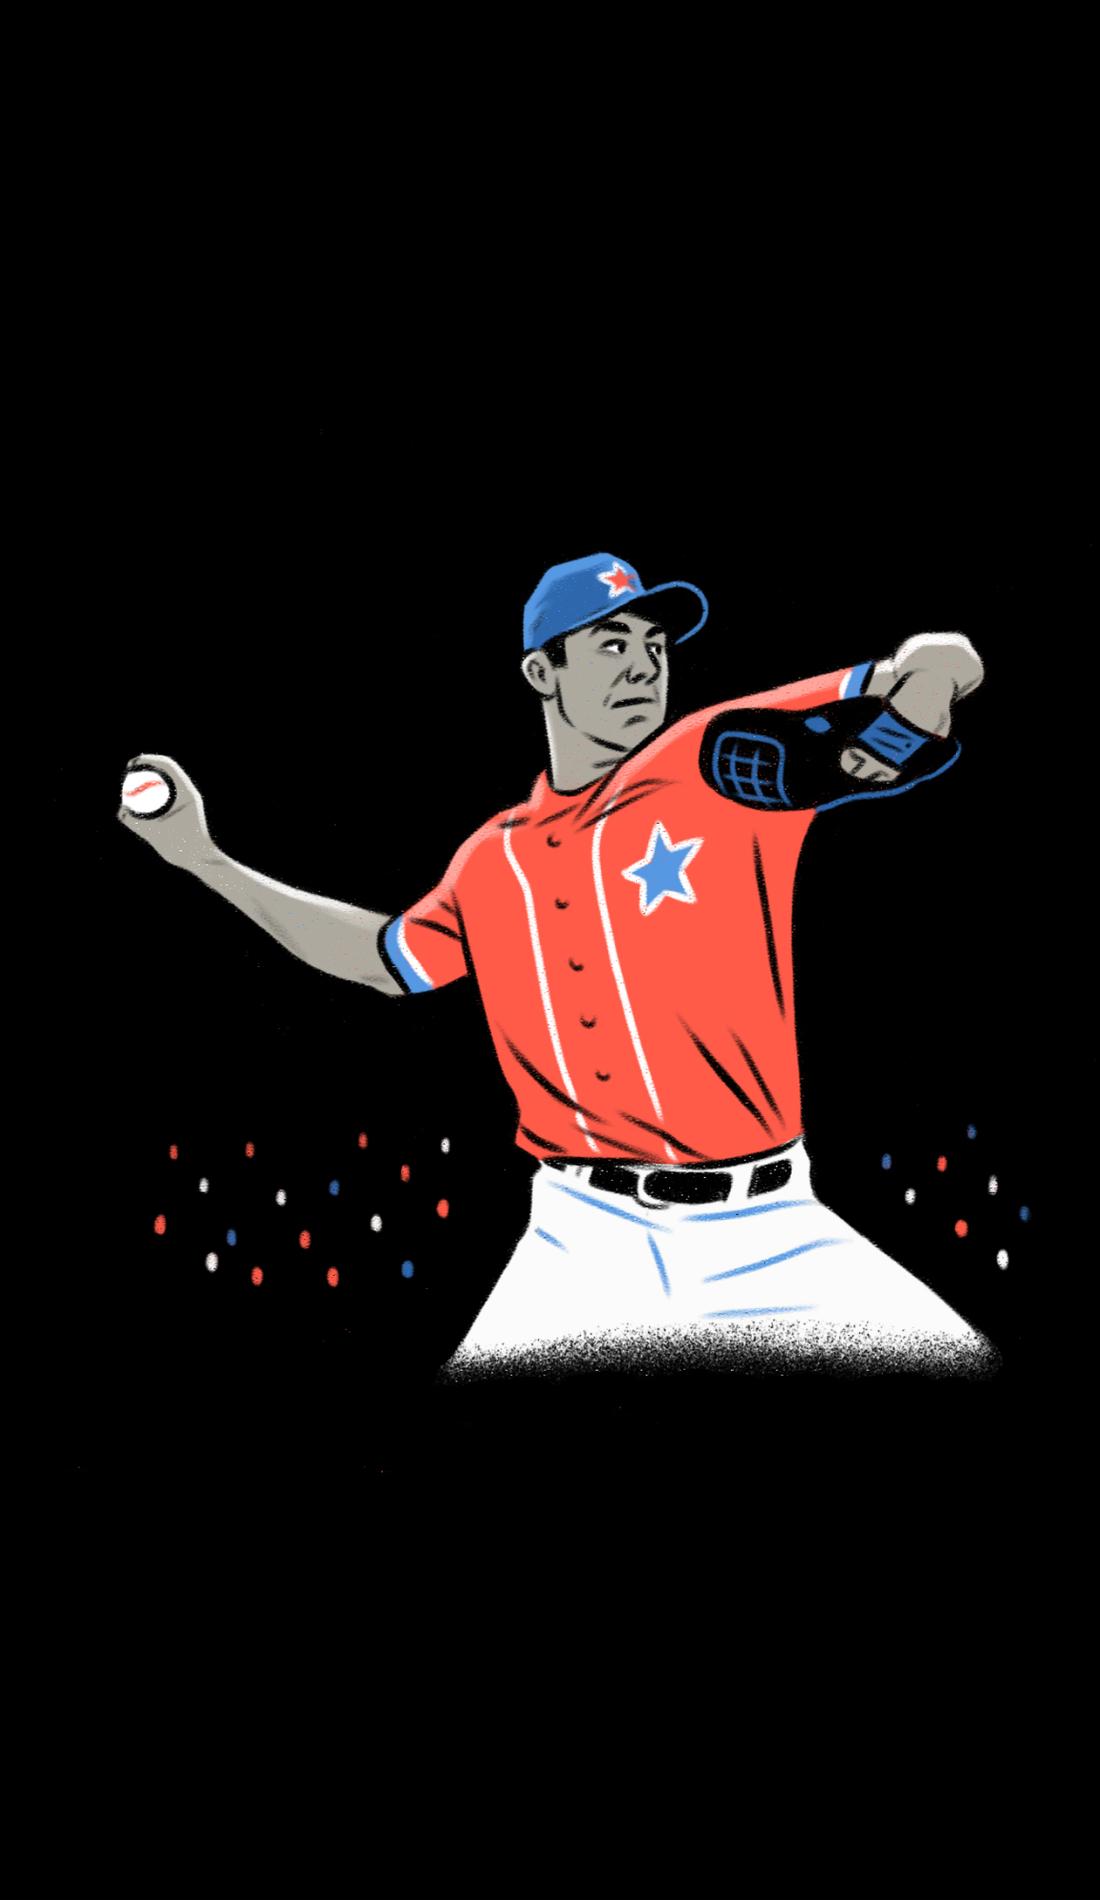 A World Baseball Classic live event